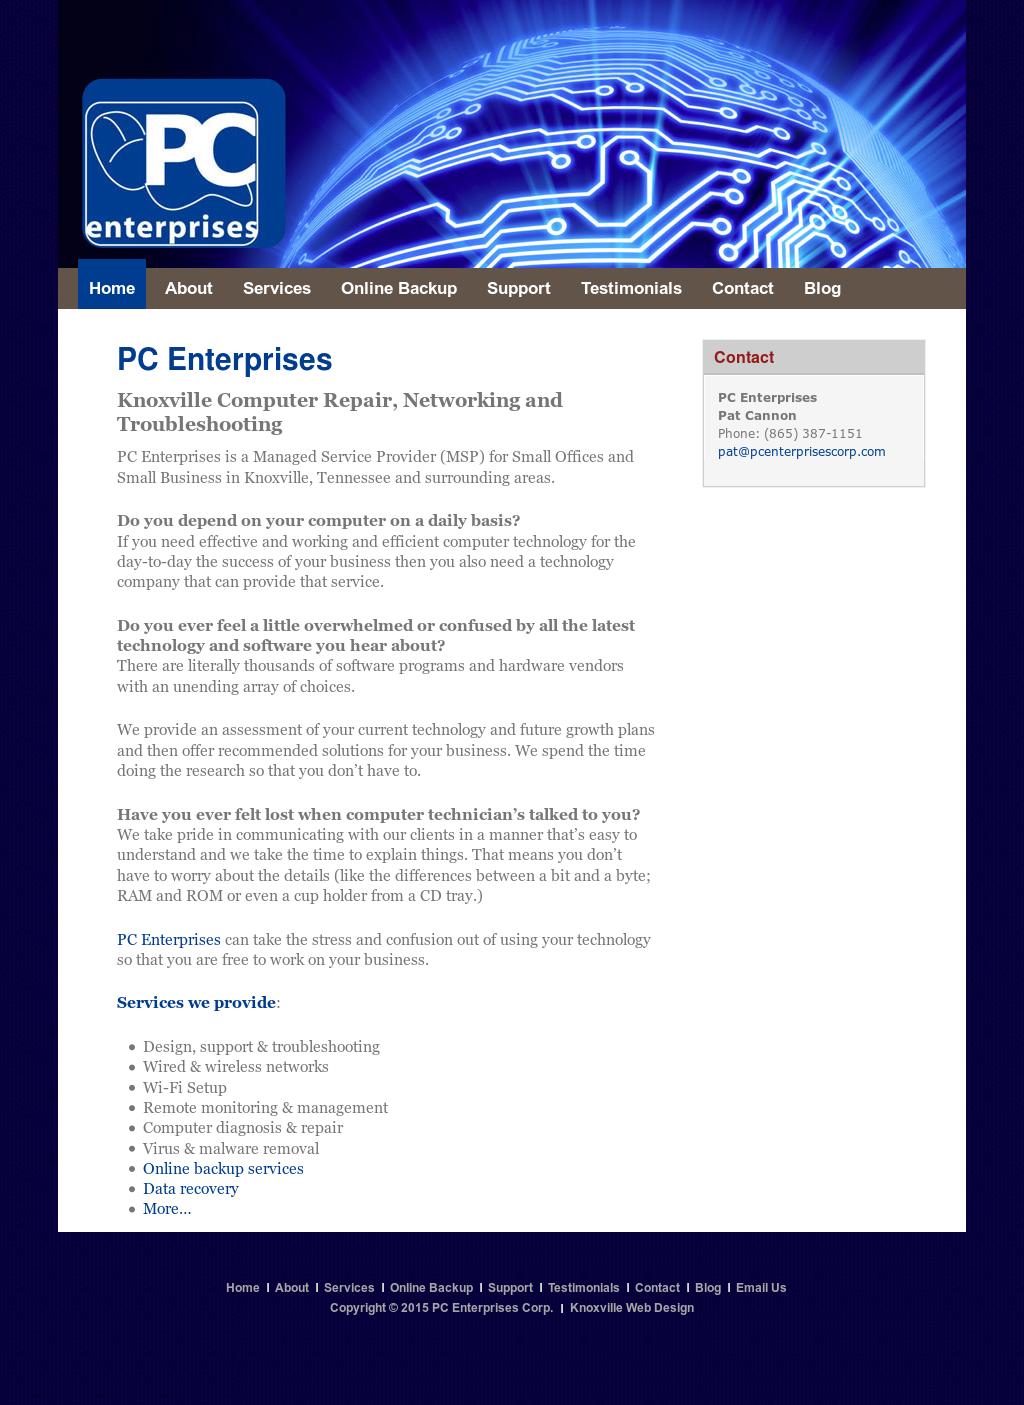 Pcenterprises Competitors, Revenue and Employees - Owler Company Profile